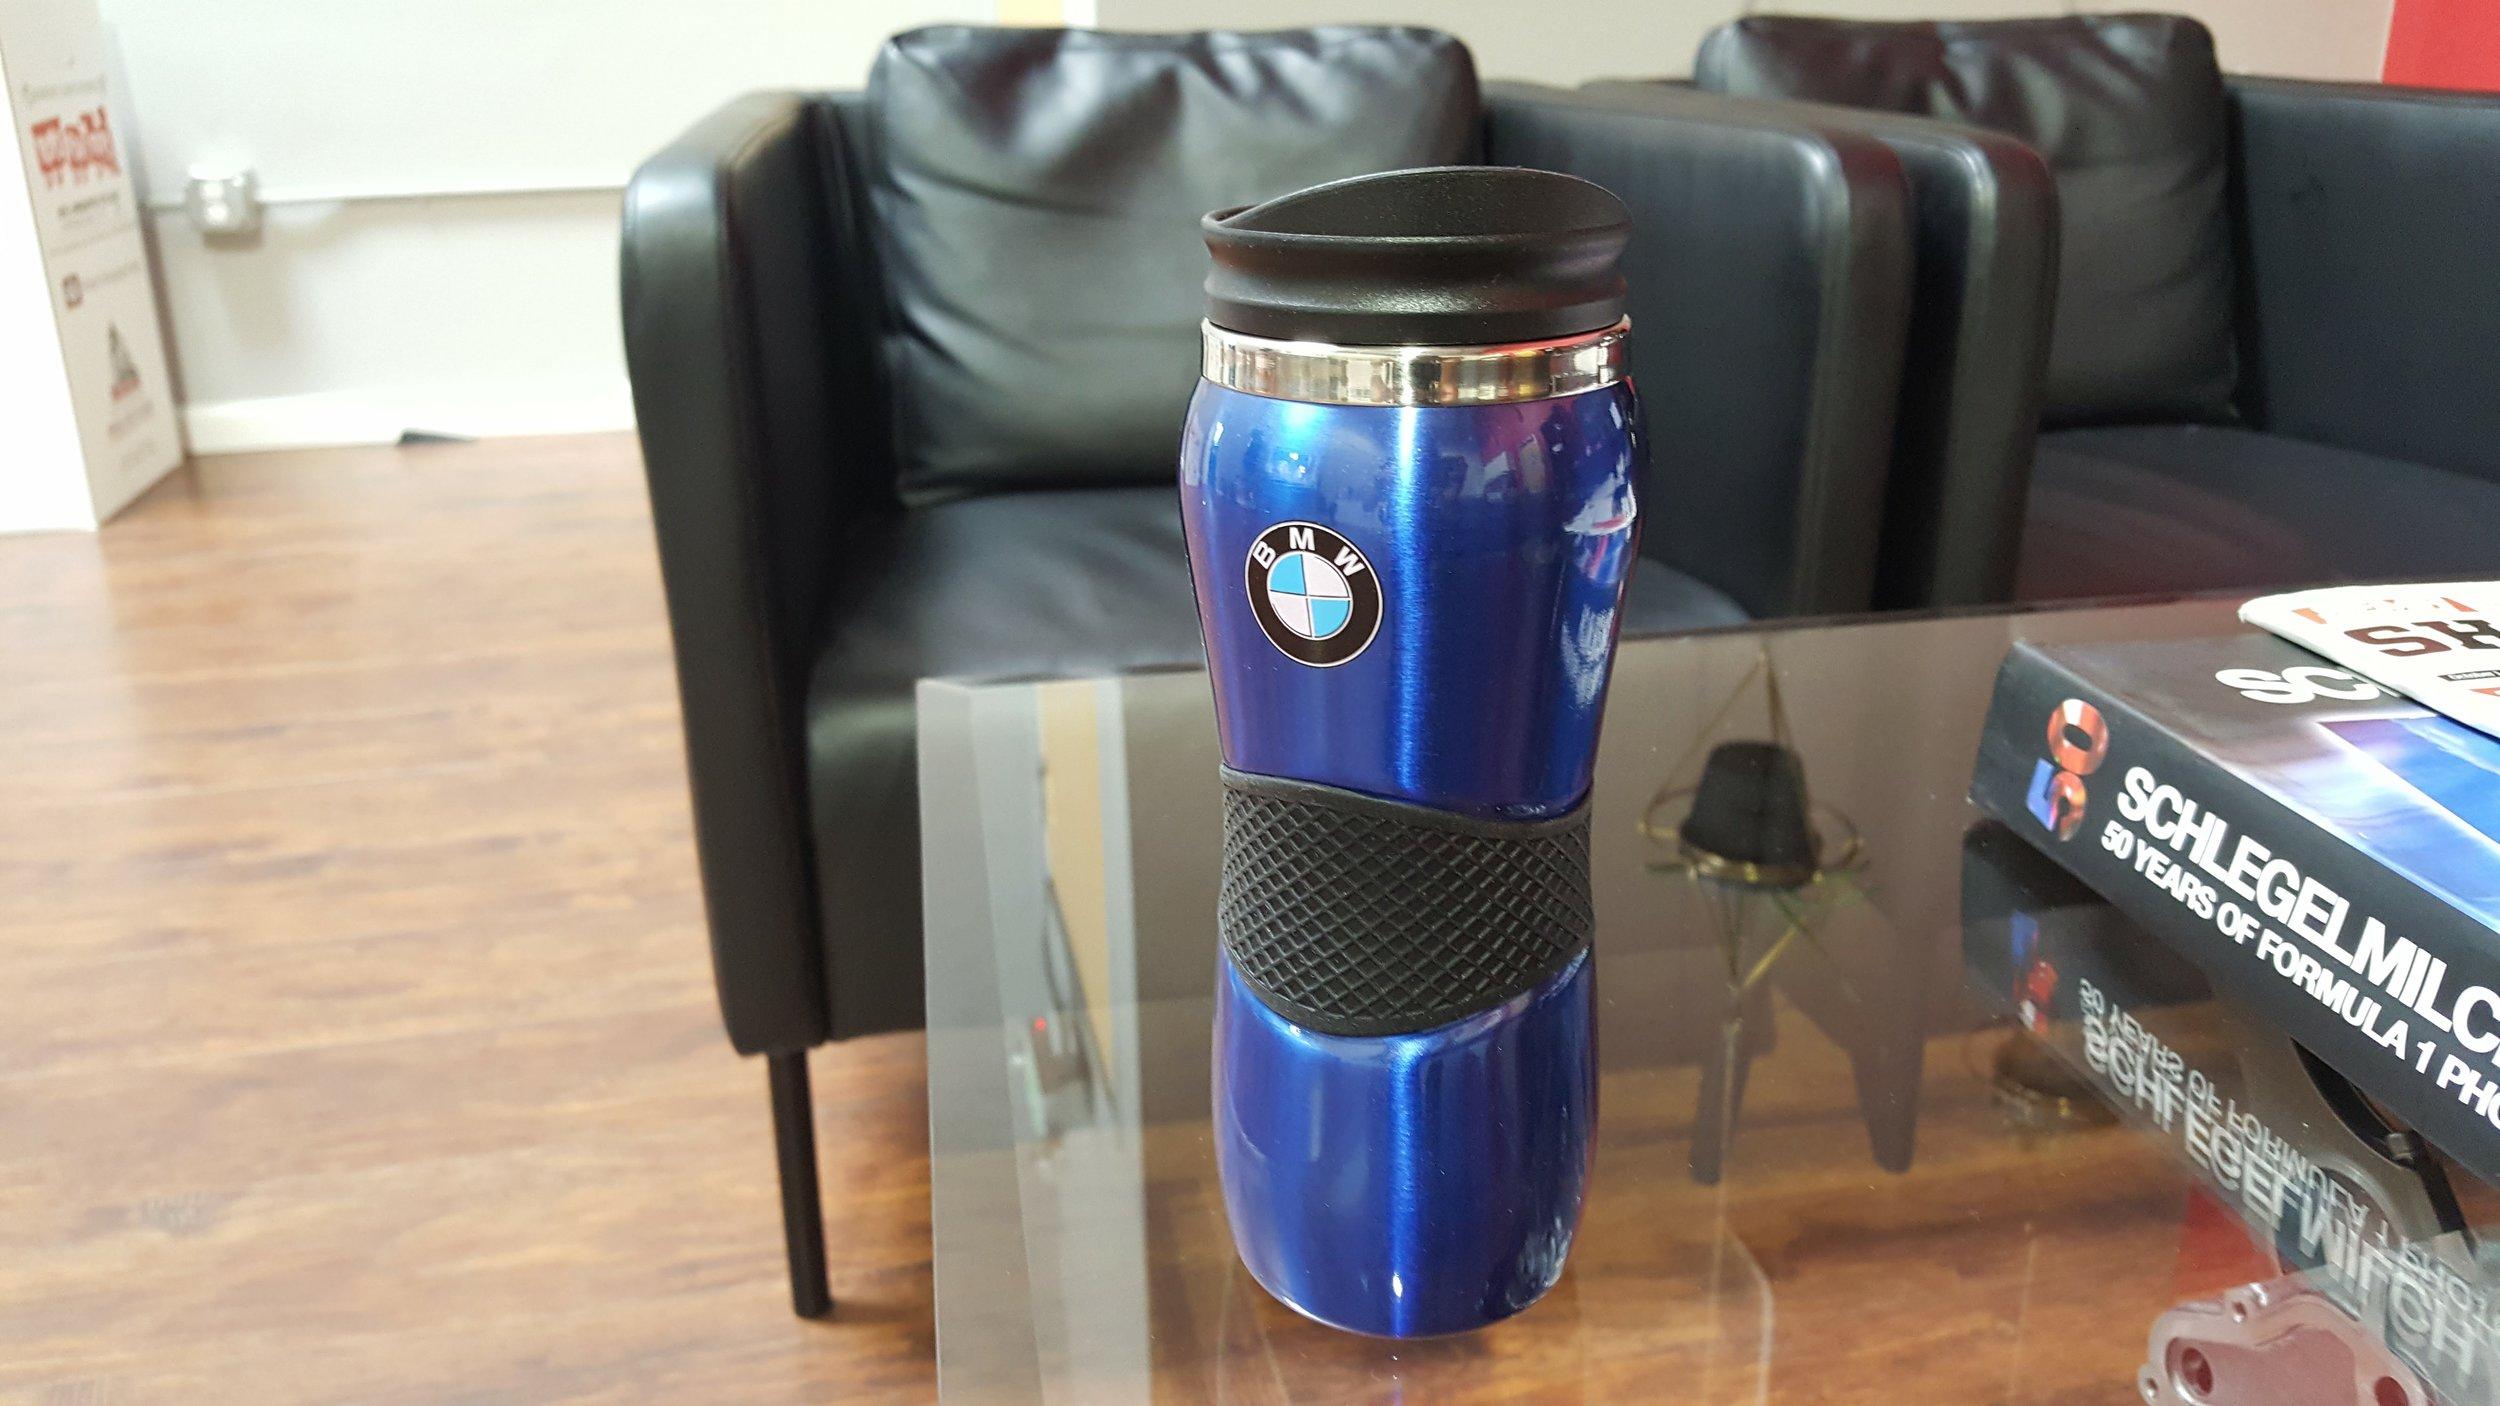 bmw travel mug  Donated by  BMW of Fremont . 1 winner. Estimated value: $21.